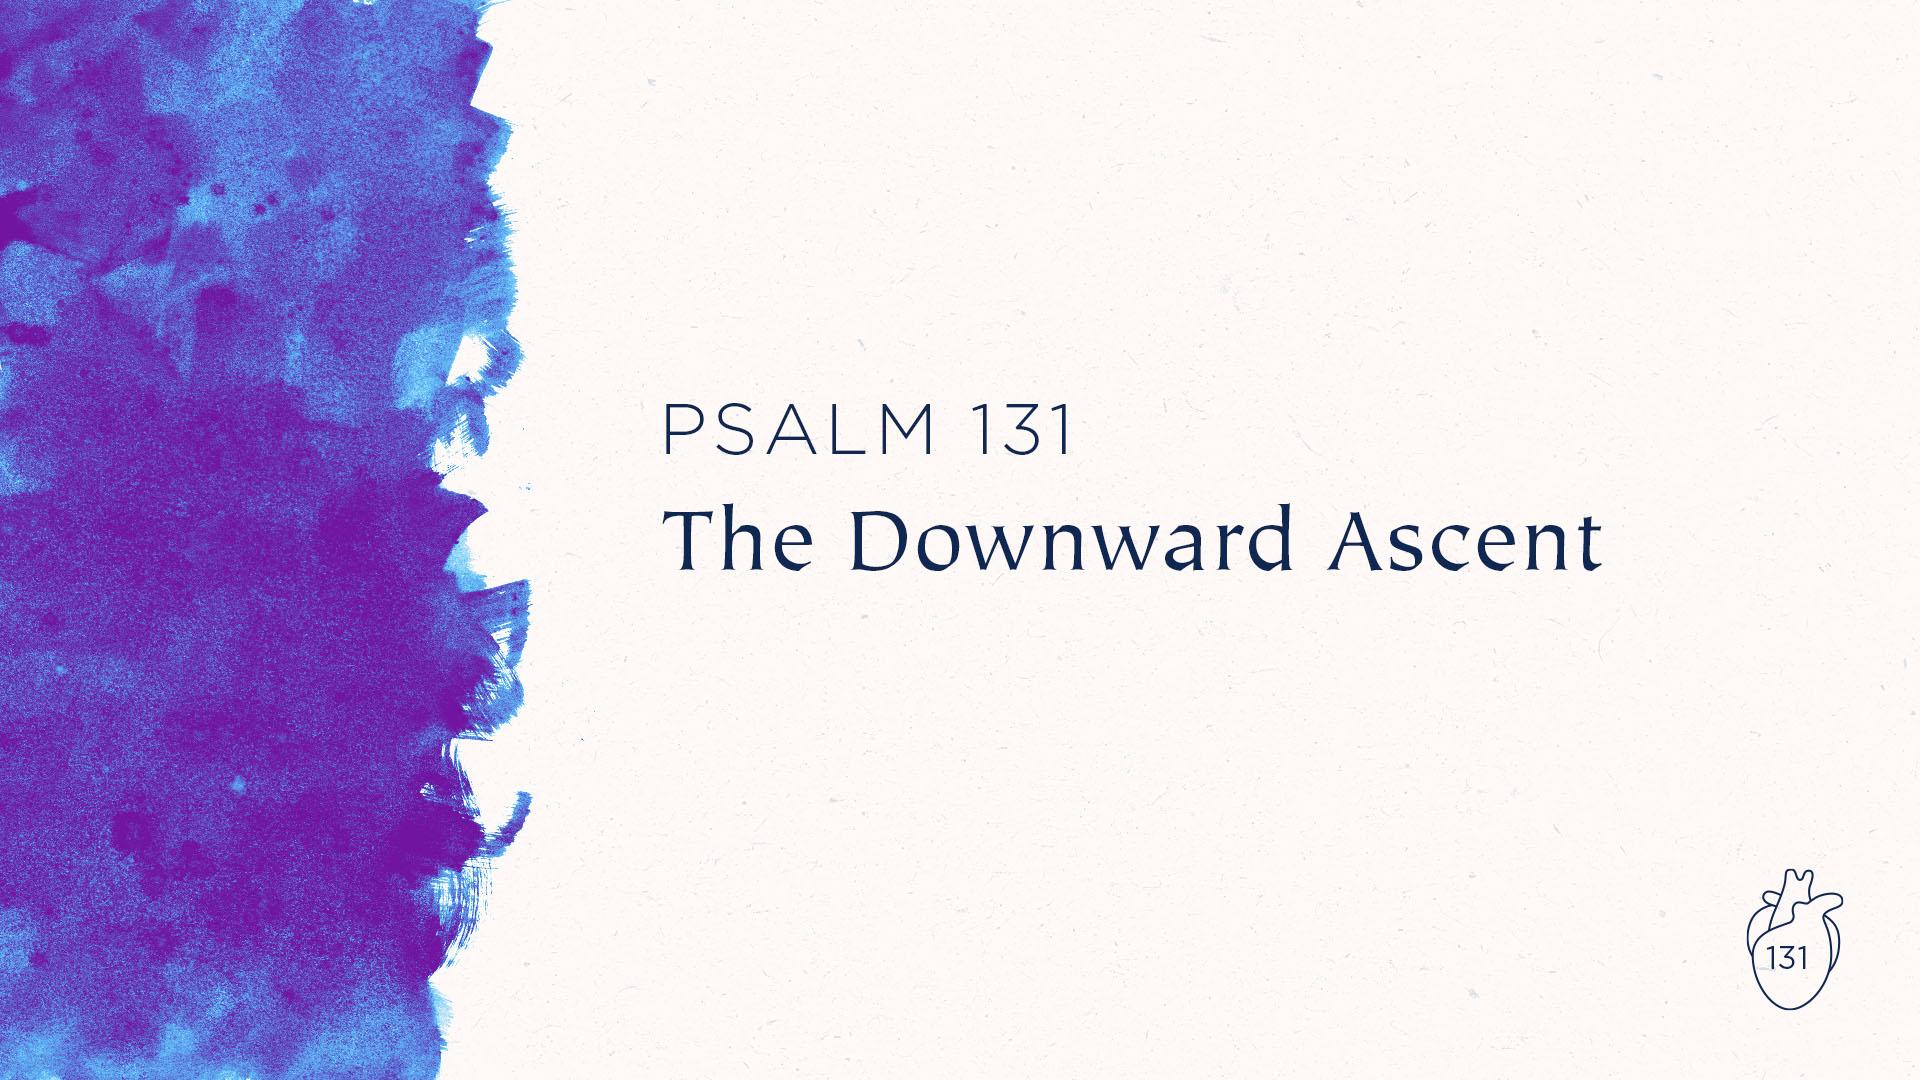 The Downward Ascent